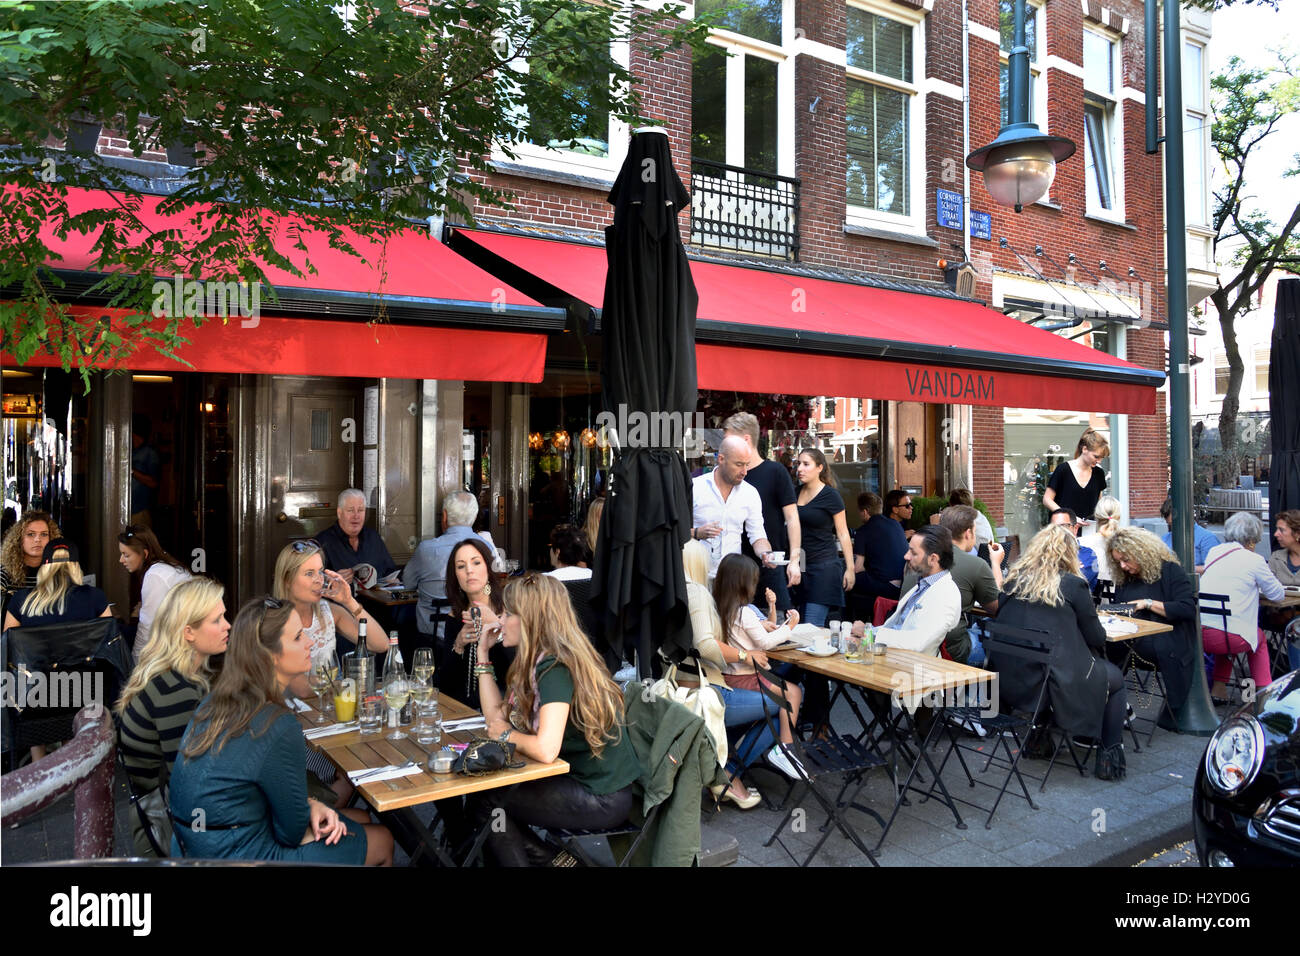 Il ristorante francese Brasserie Van Dam Cornelis Schuytstraat Oud Zuid olandese di Amsterdam Paesi Bassi Foto Stock